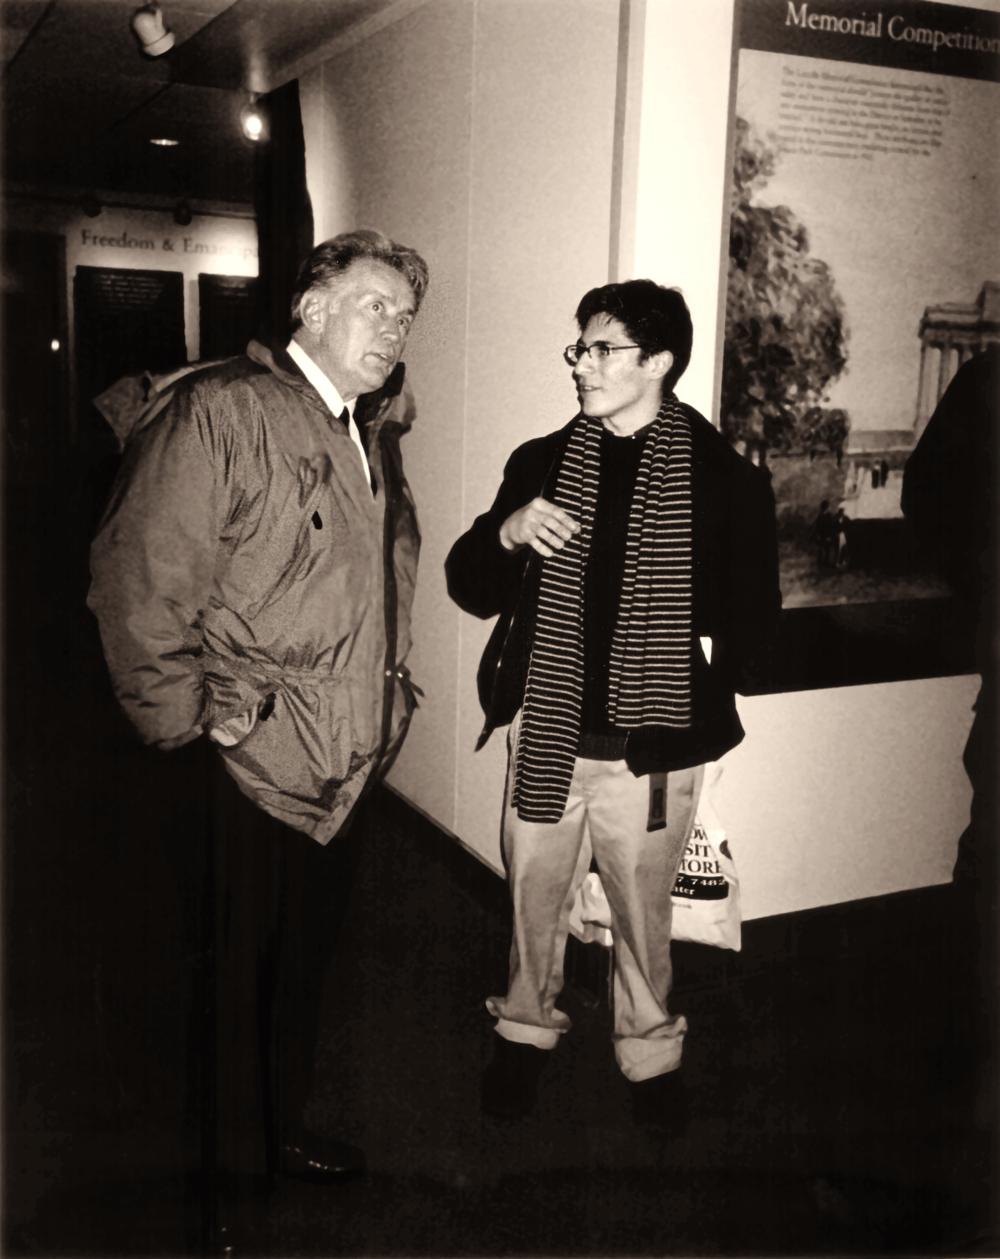 Octavio Gonzalez with his mentor Martin Sheen.Photo Courtesy of Octavio Gonzalez